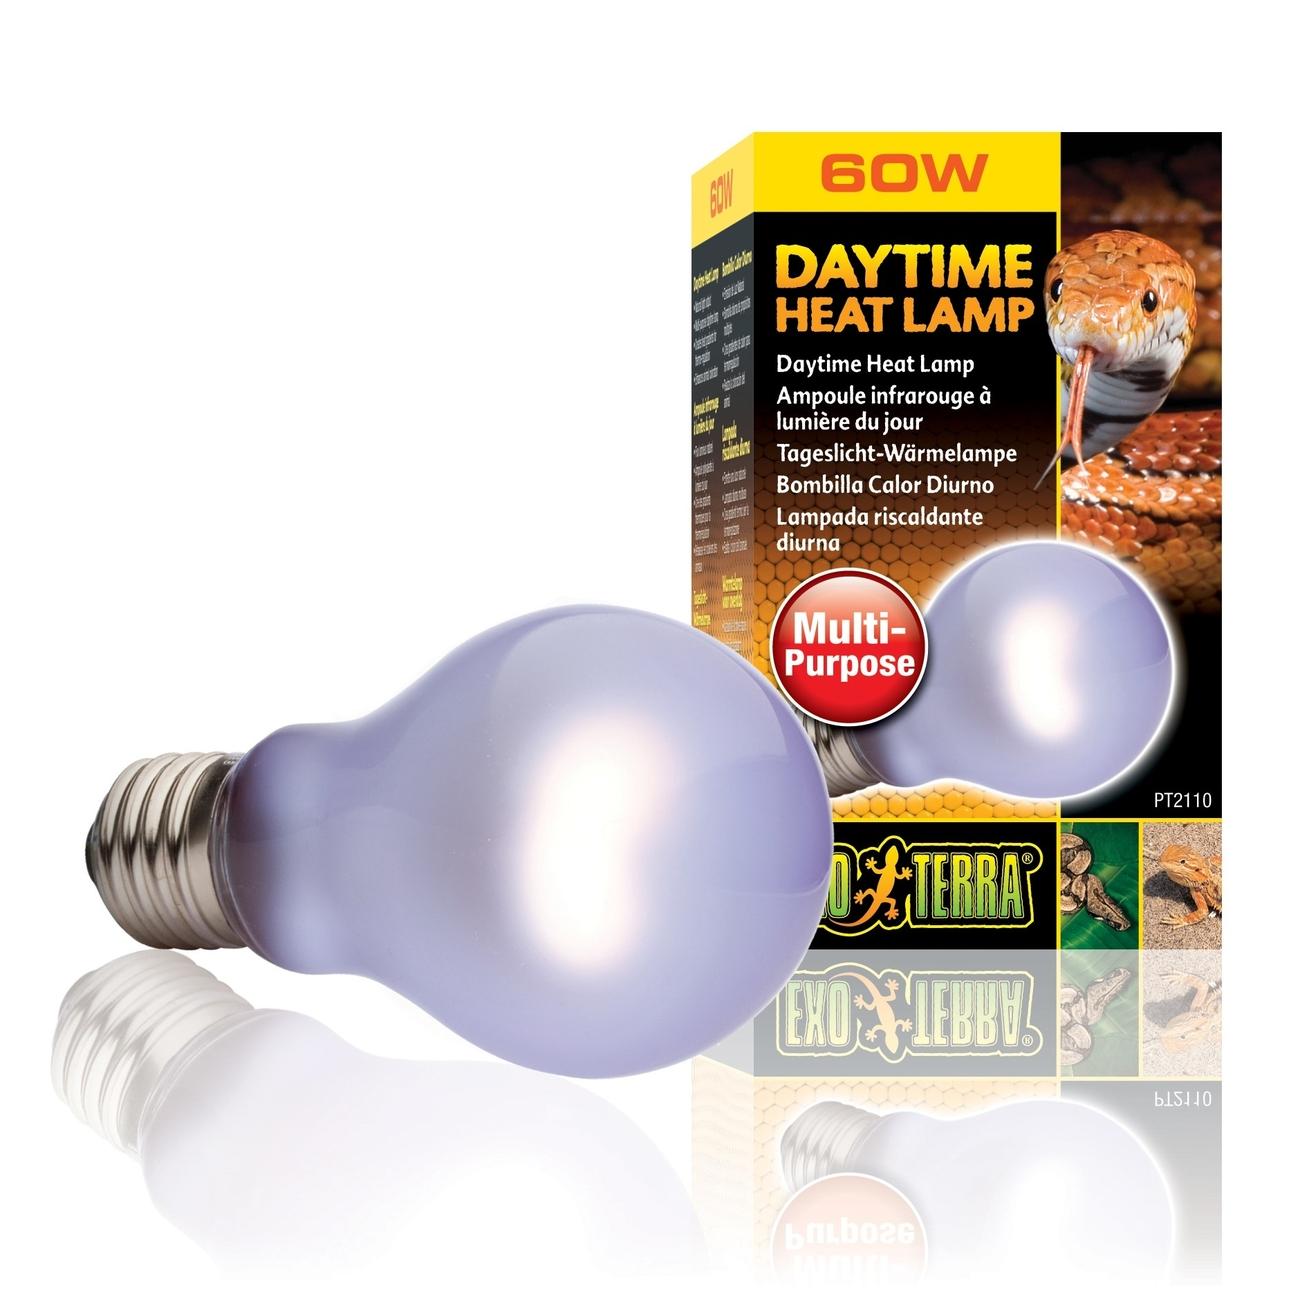 Exo Terra - Daytime Heat Lampe Bild 7